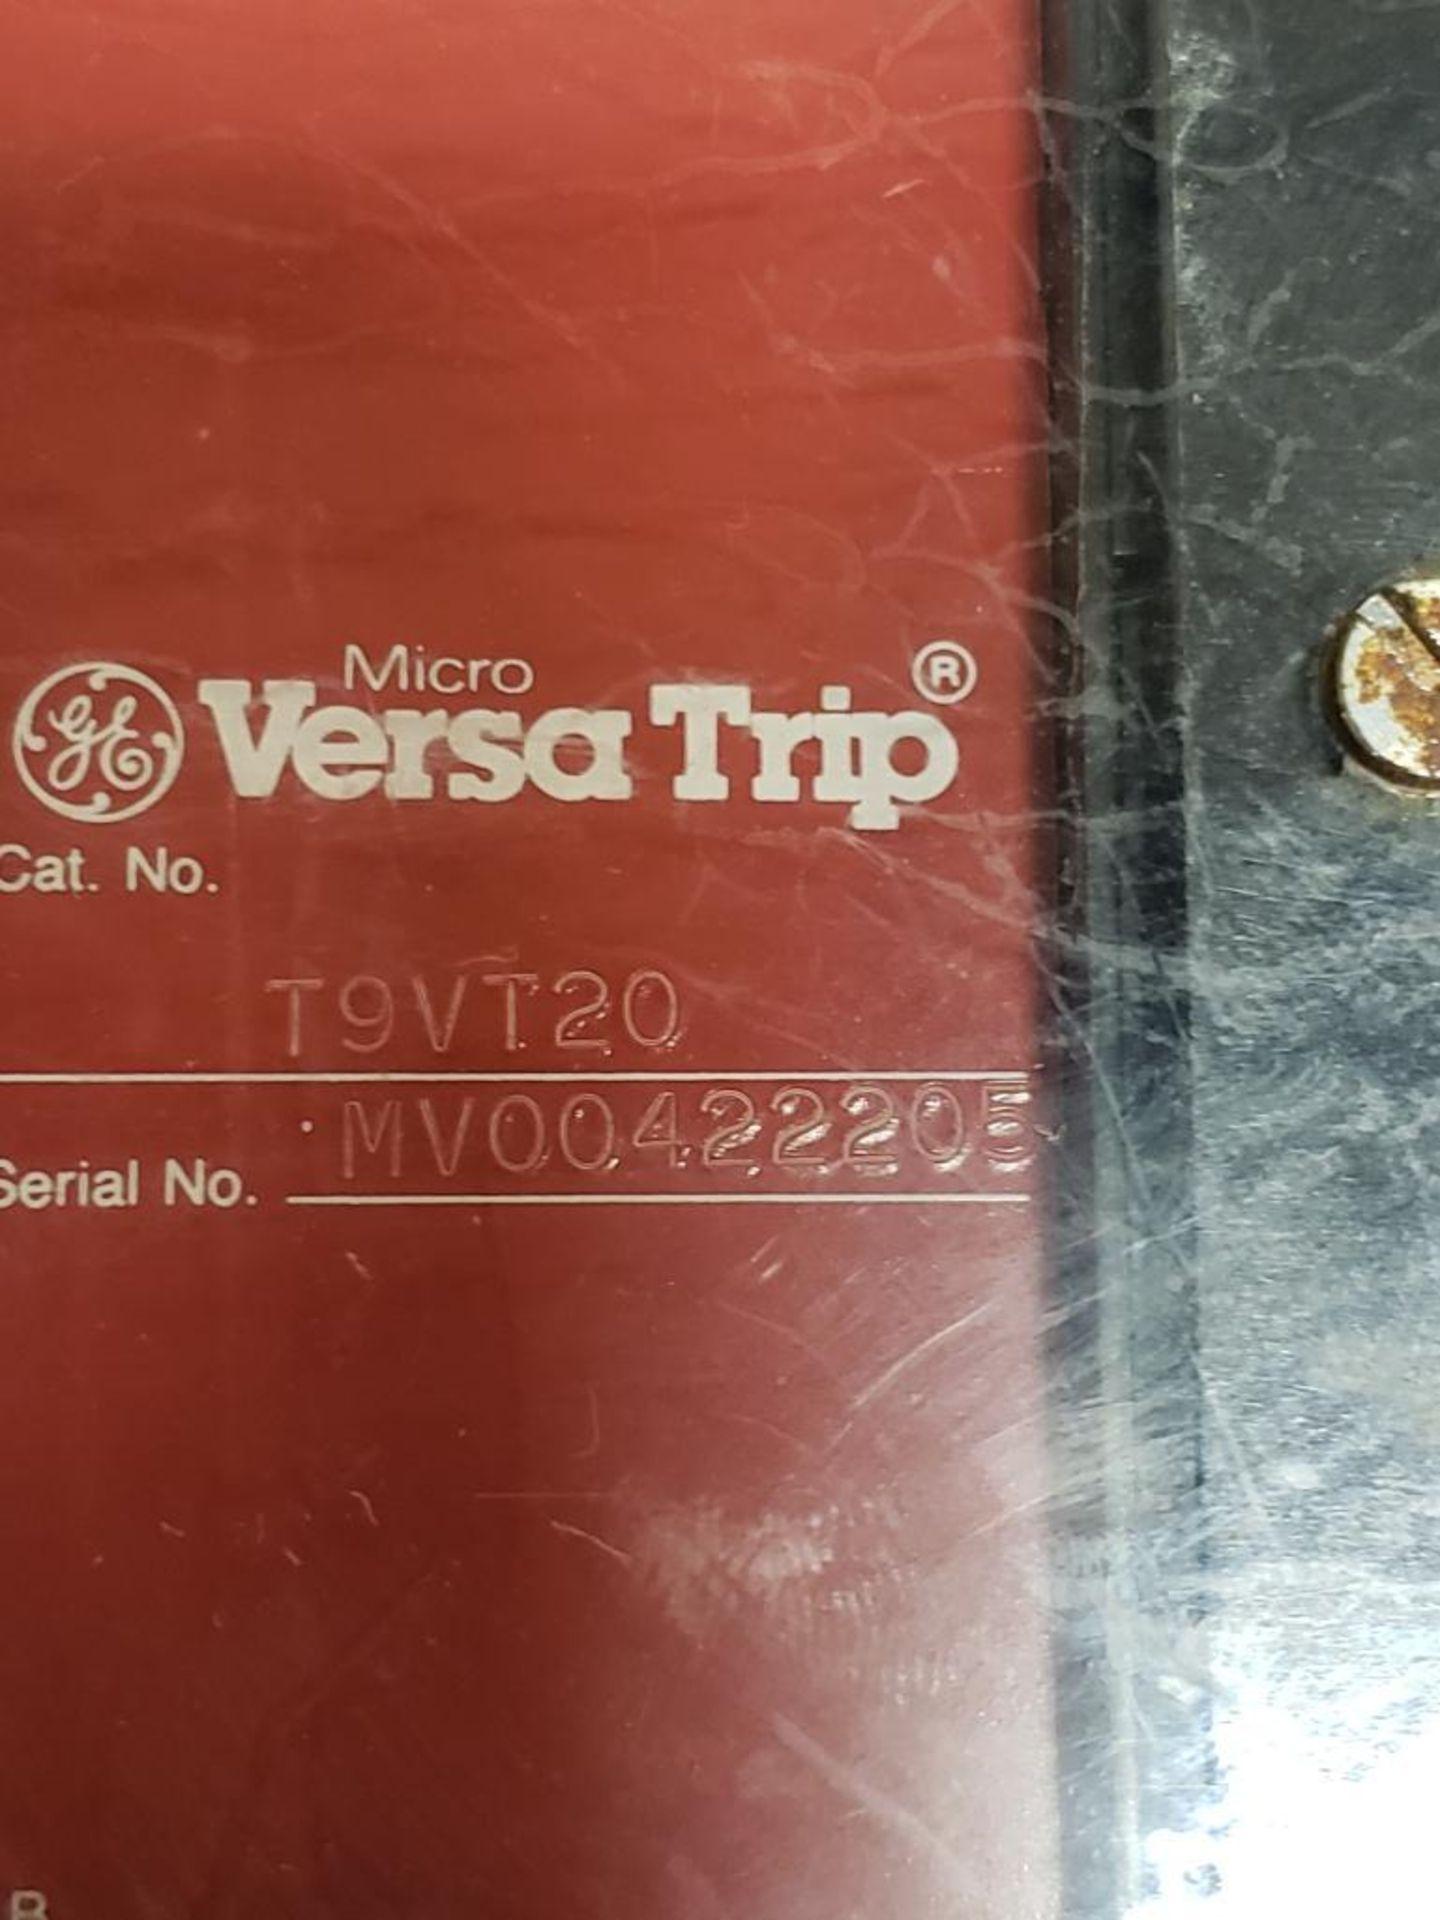 GE Micro Versa Trip T9VT20 Breaker. 1200Amp, 3-Pole. - Image 2 of 6